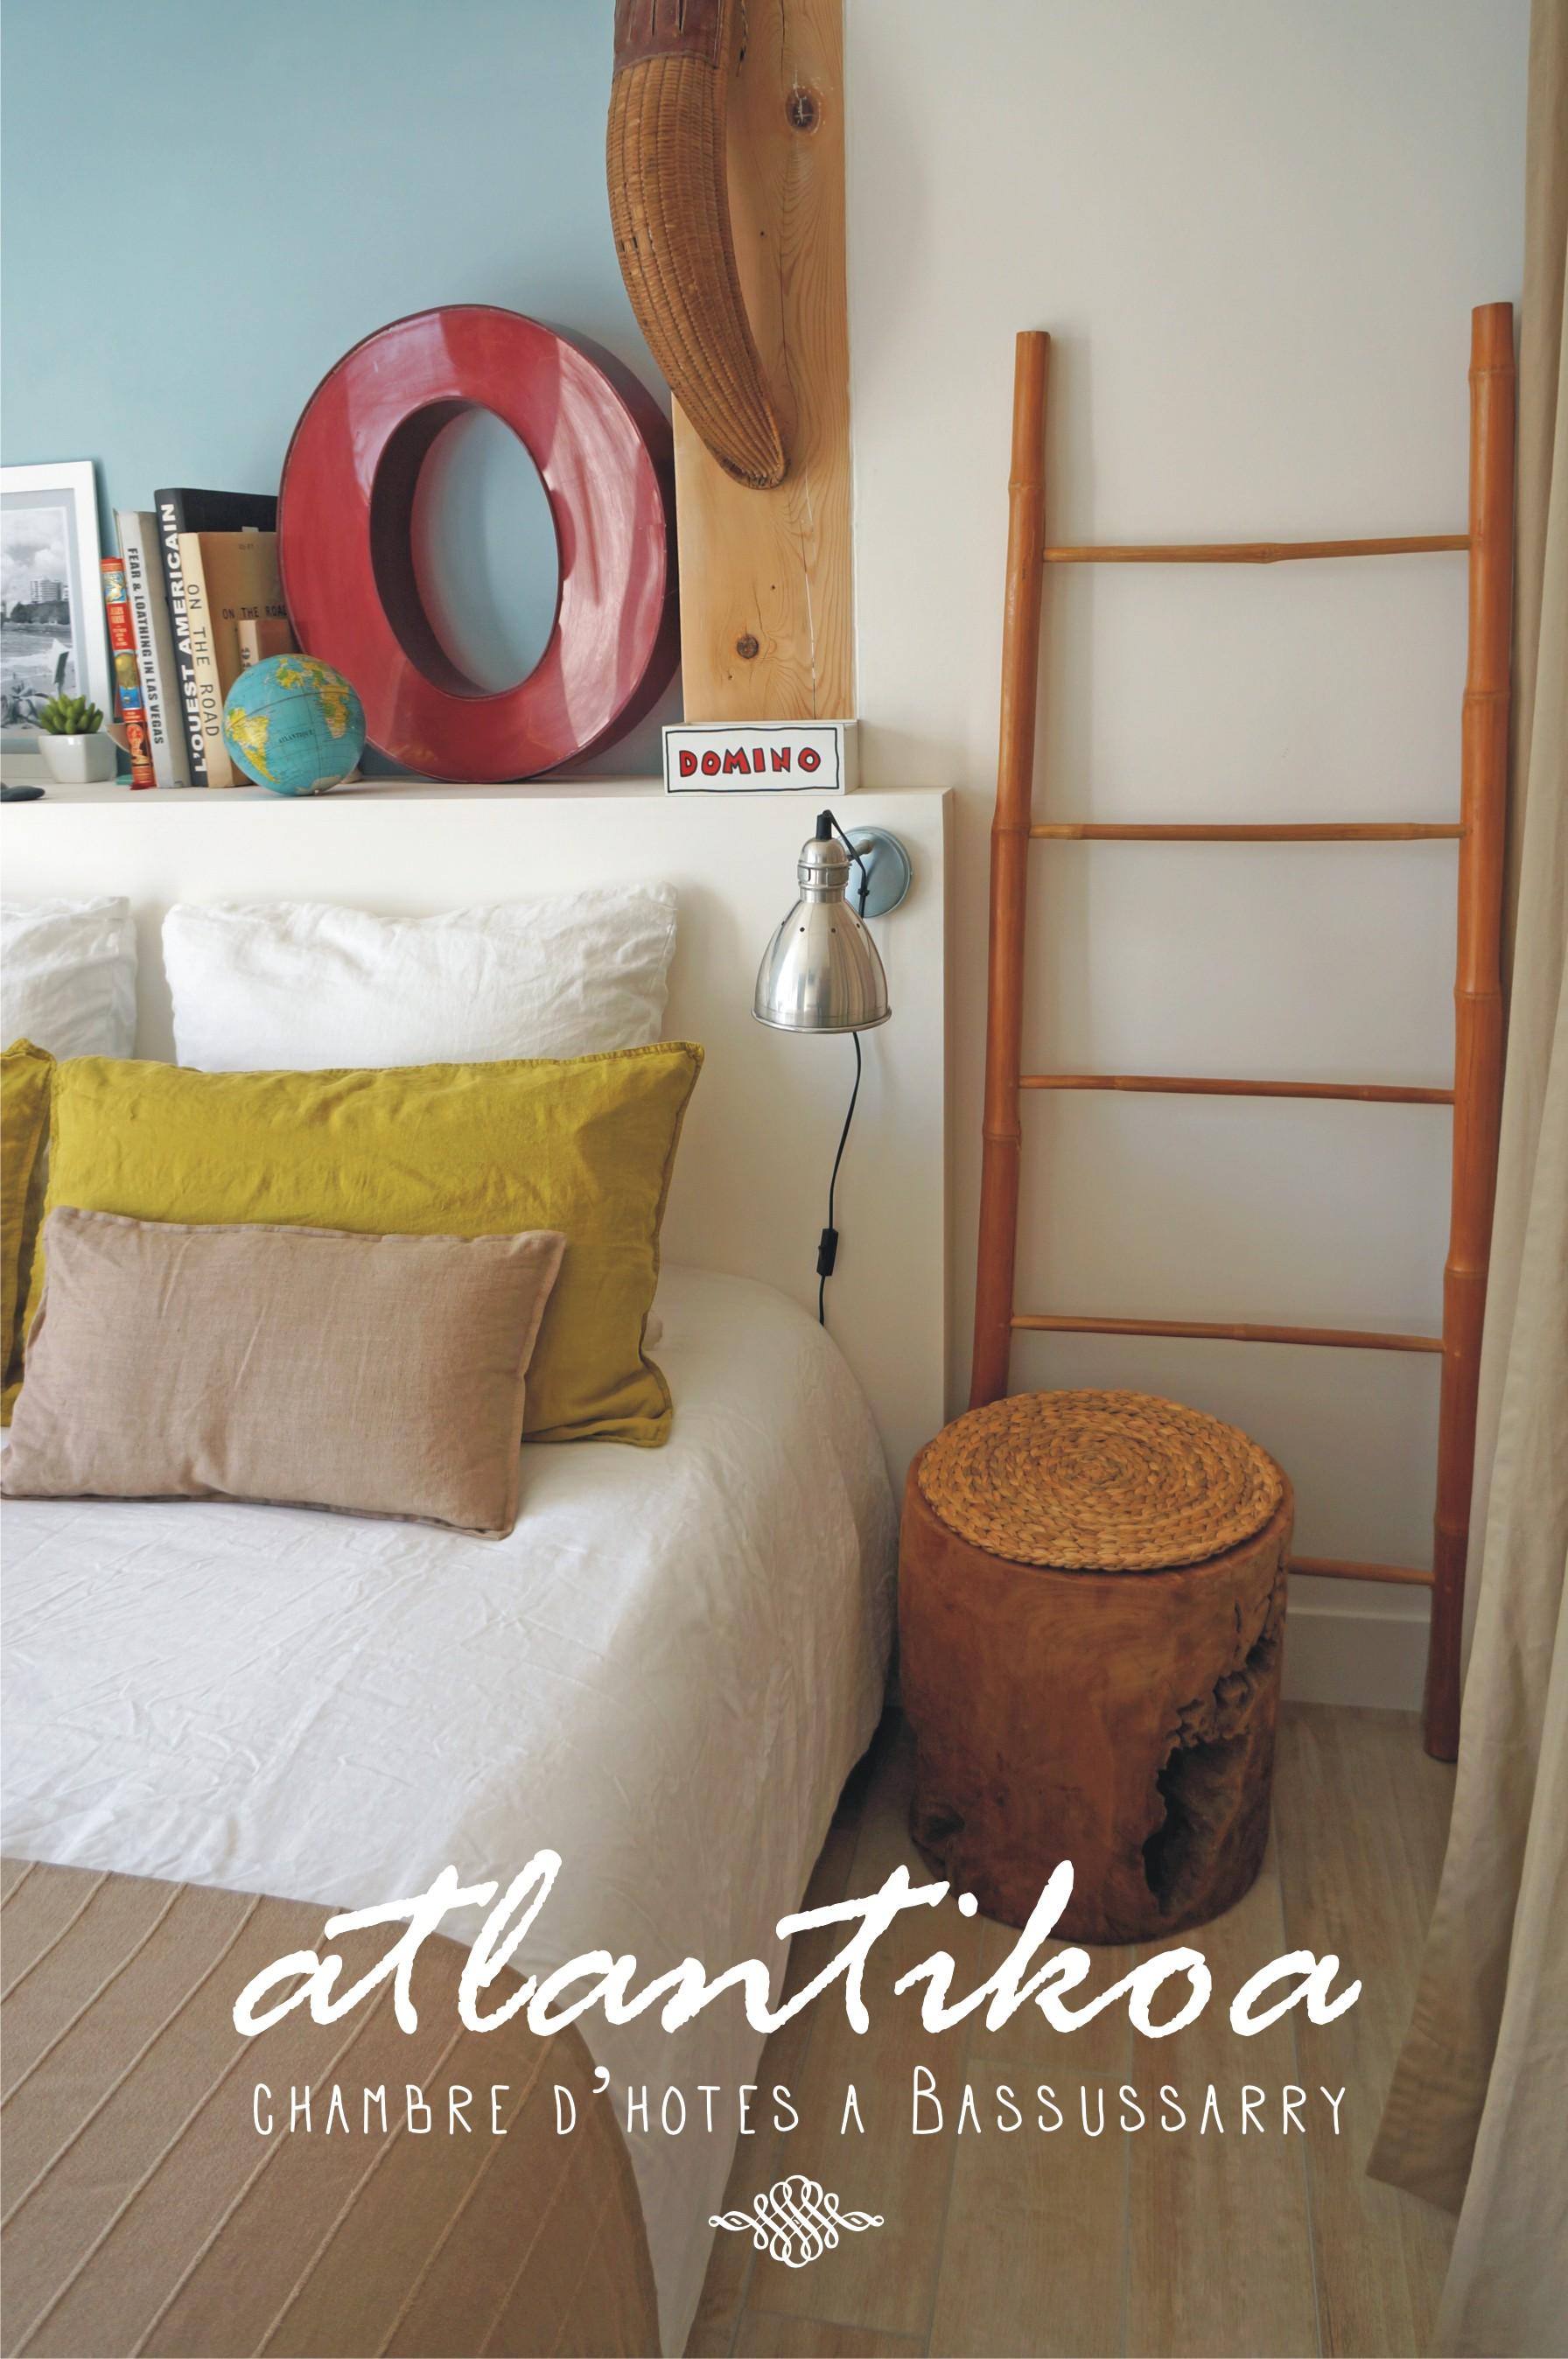 Cadeau chambre d h´te Pays Basque Biarritz – Atlantikoa chambre d